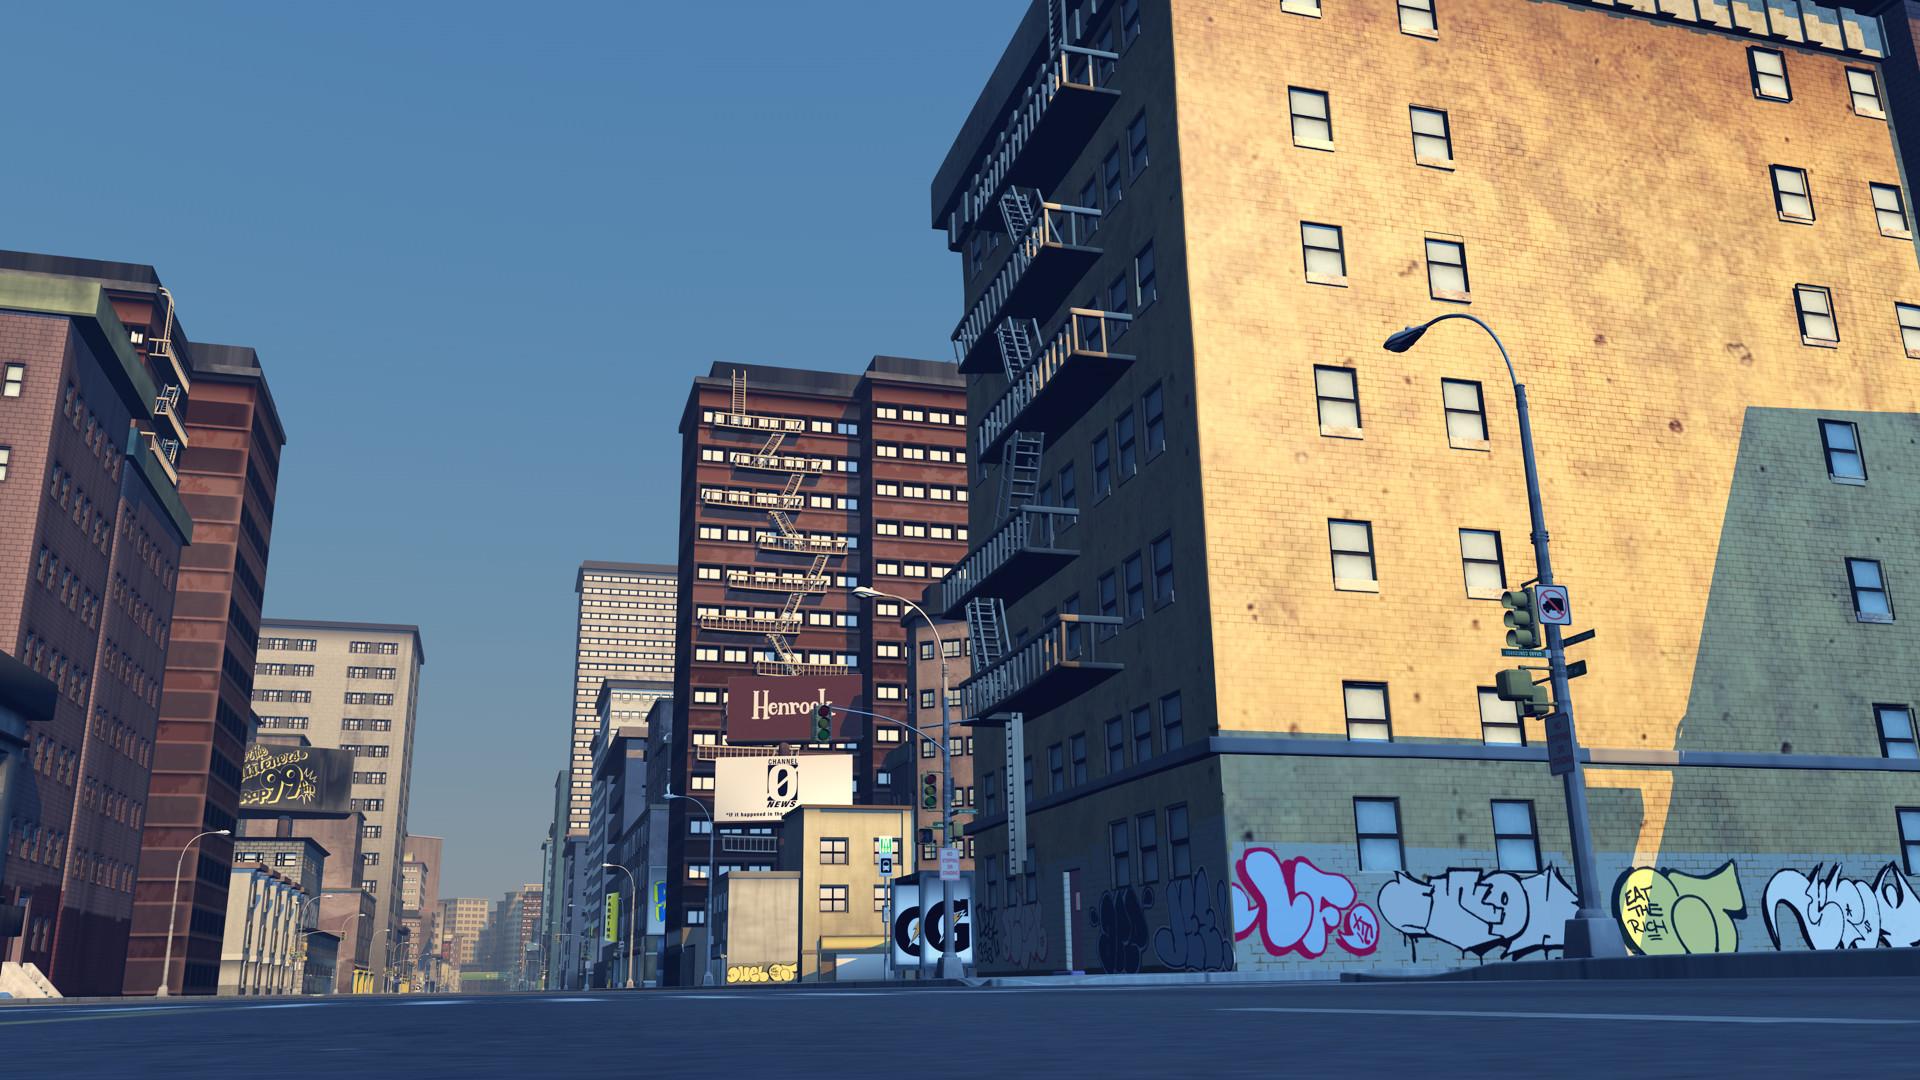 Blokhedz animation background – city street